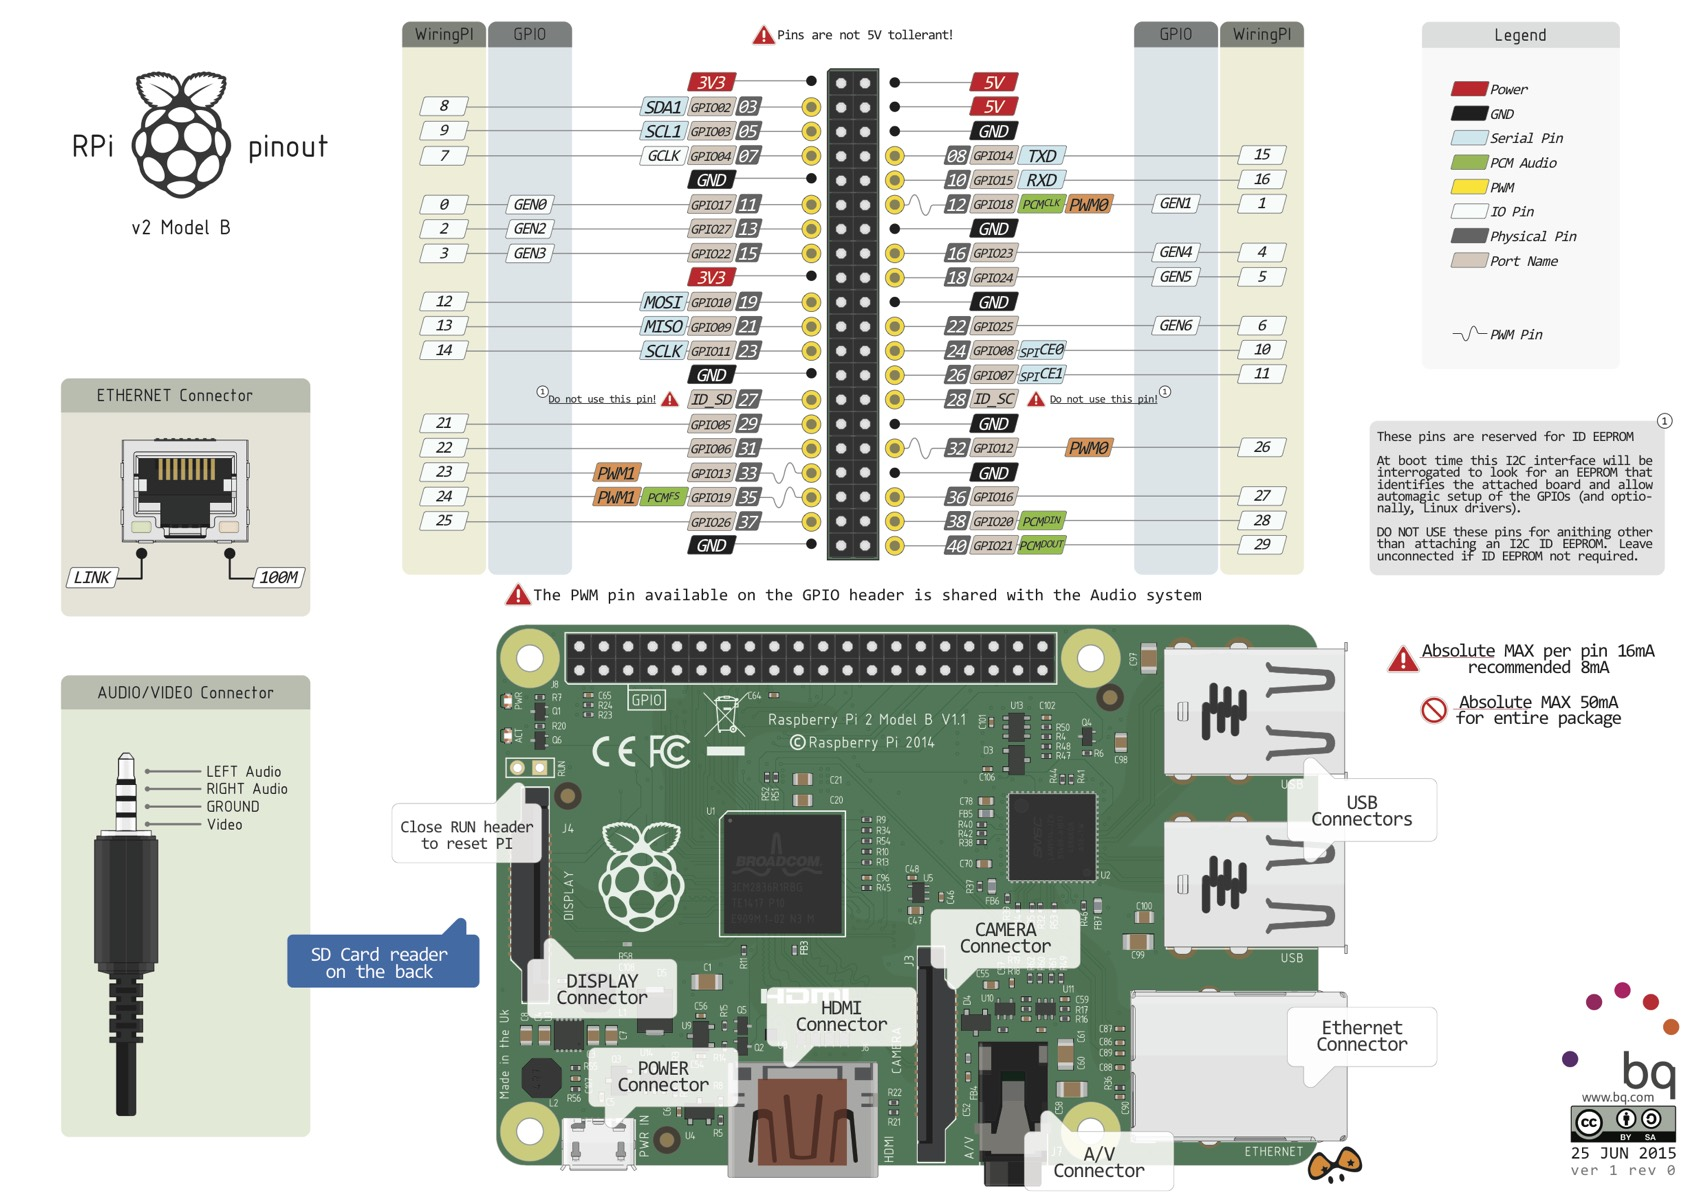 Raspberry Pi v2 Mod B Pinout @Raspberry_Pi #raspberrypi ...